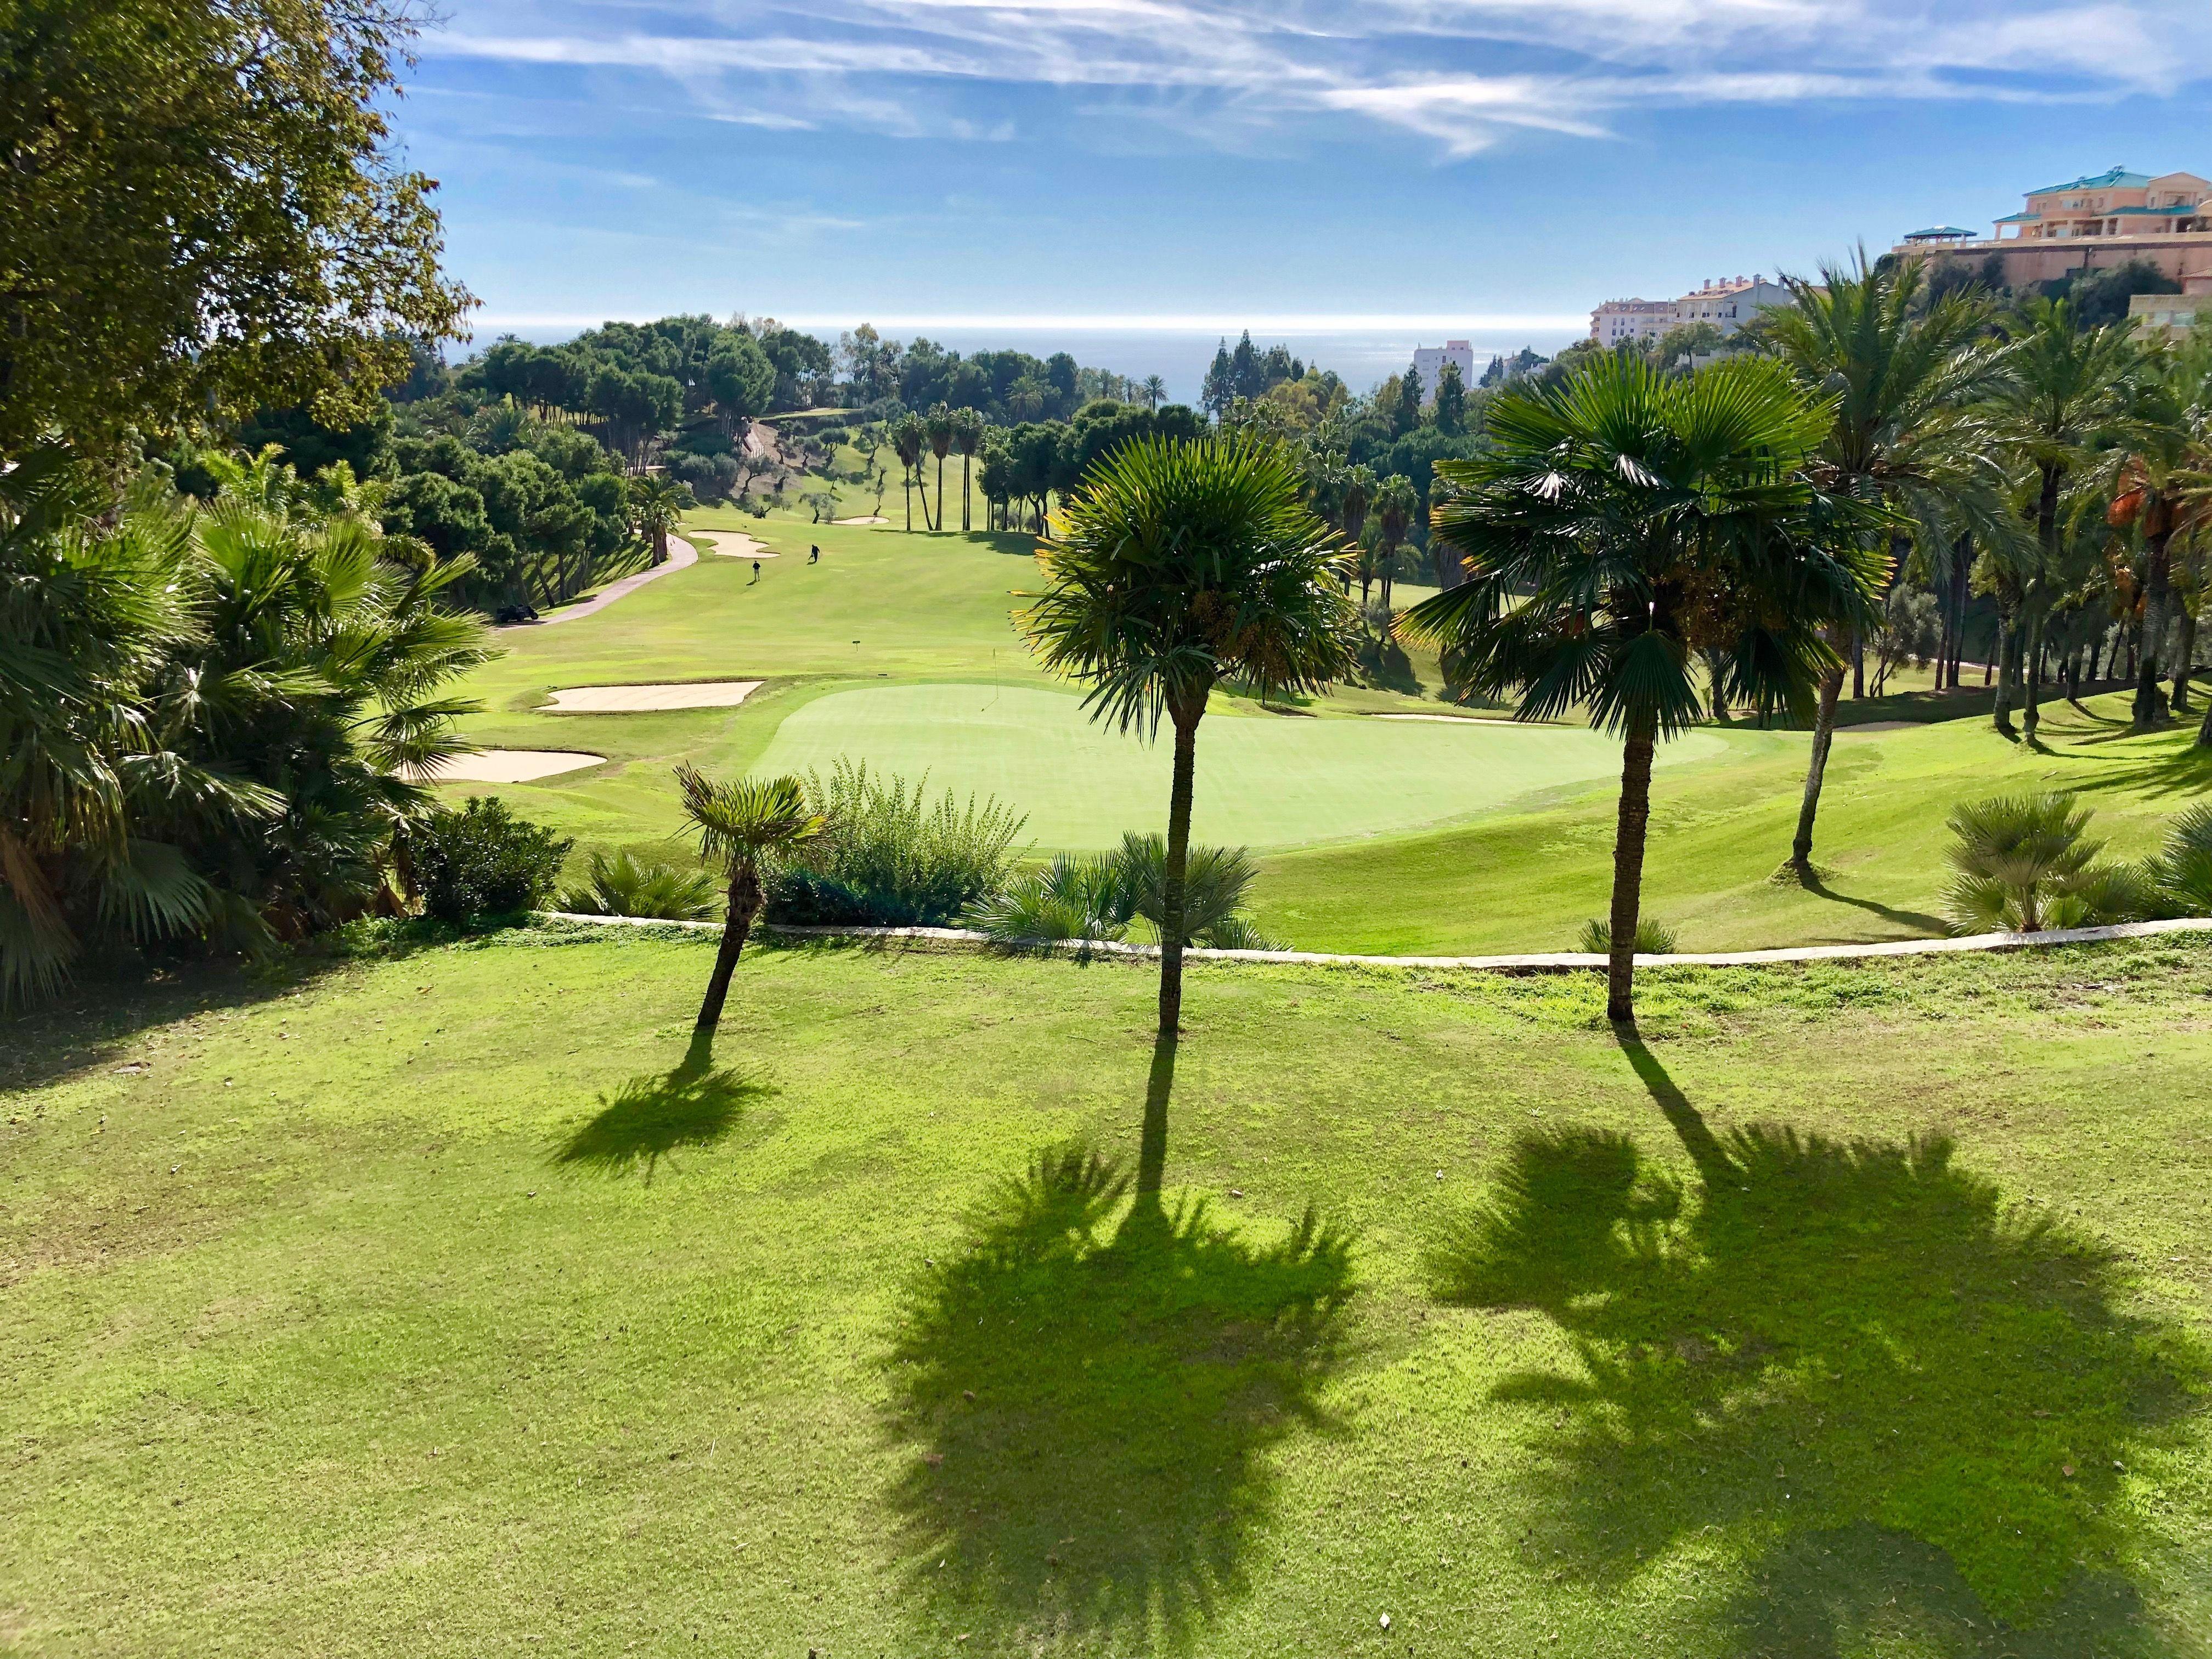 Torrequebrada Golf Golf Courses Public Golf Courses Top Golf Courses